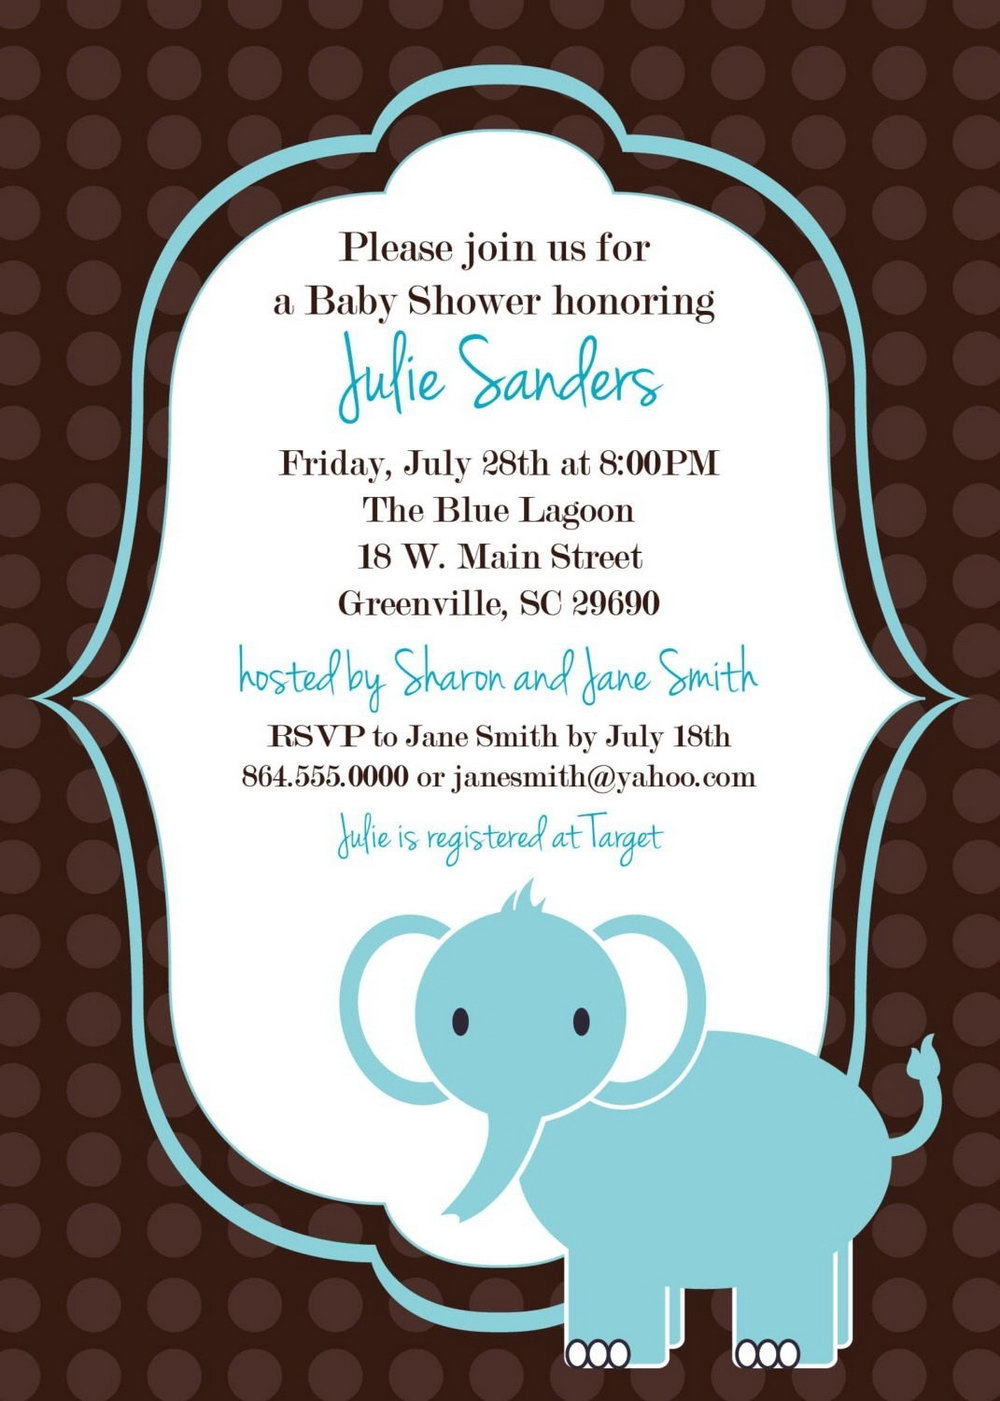 Winter Wonderland Baby Shower Invitations Templates